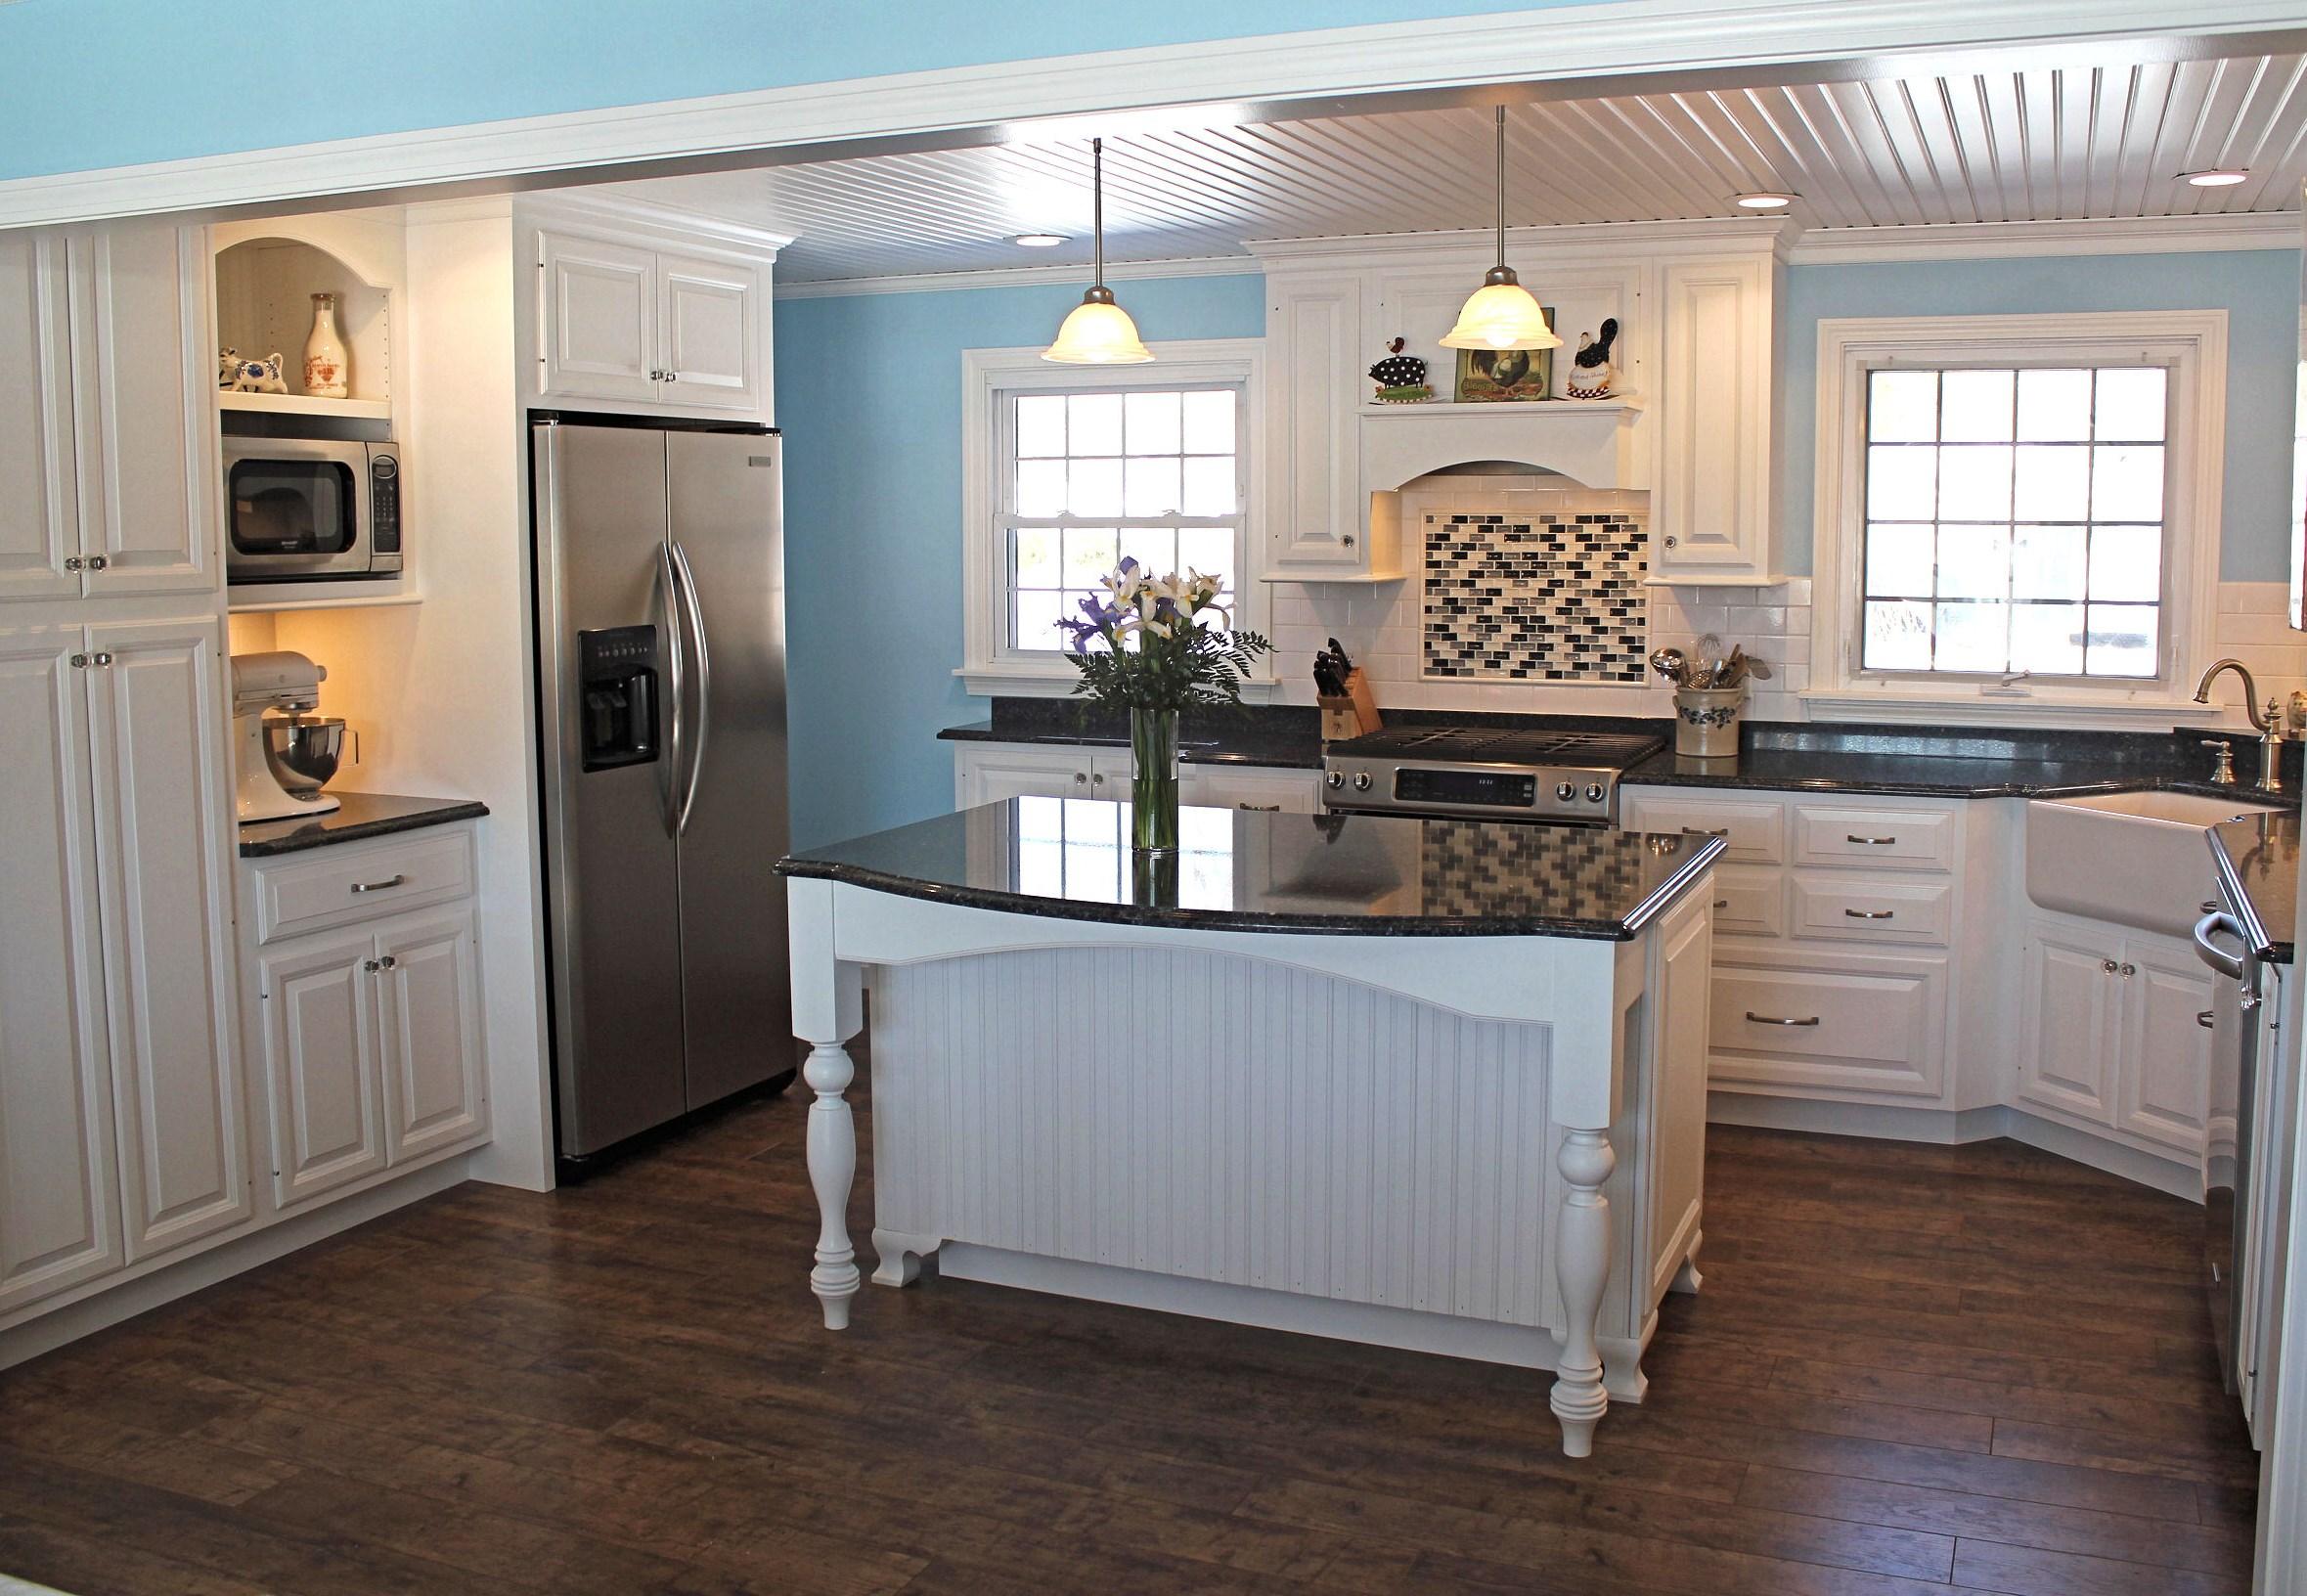 solana - beadboard kitchen - Copy.jpg